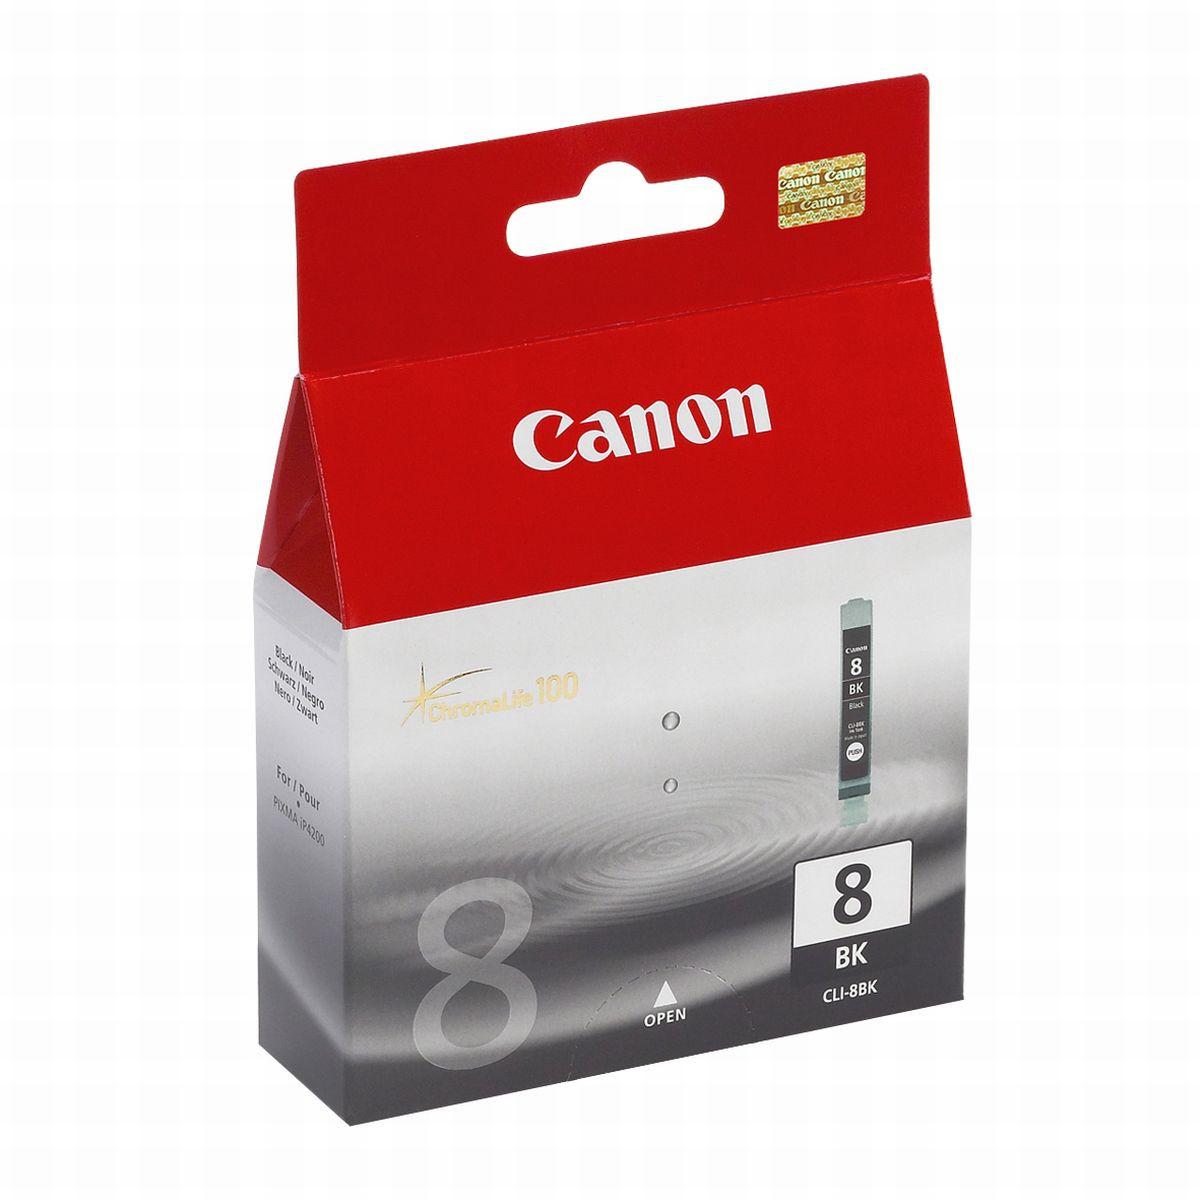 Canon CLI-8BK Photo Black Ink Tank